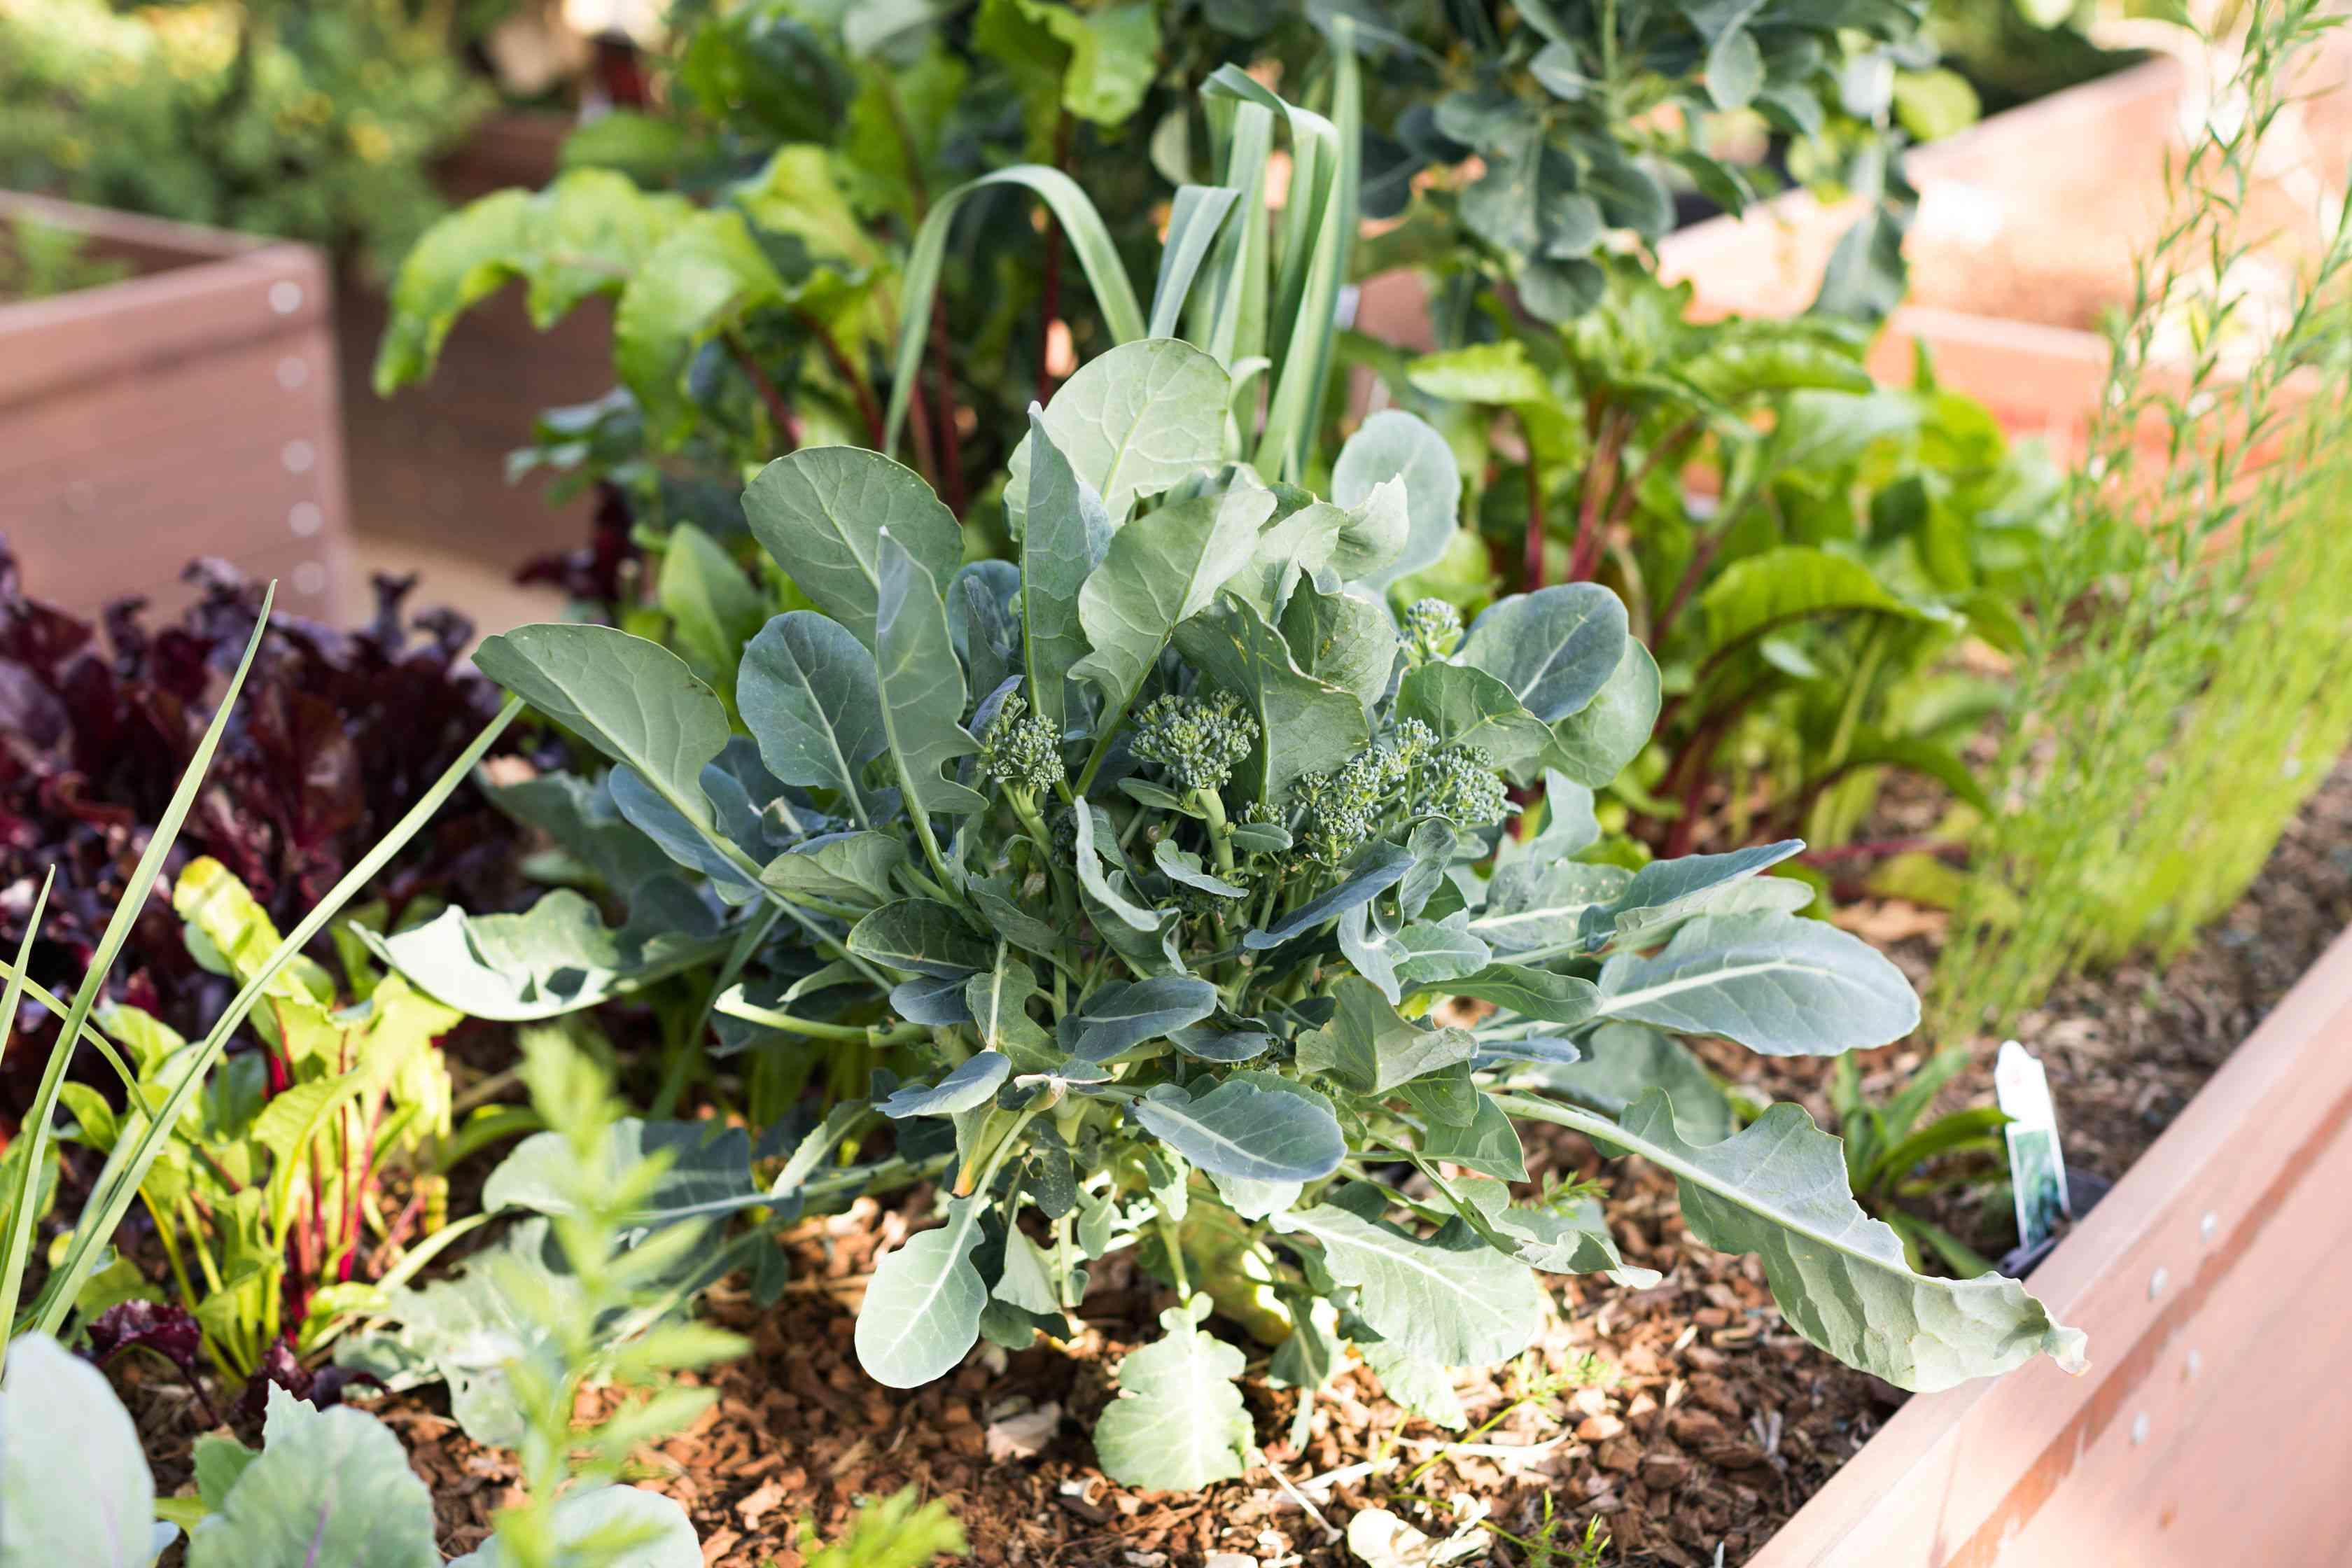 Broccoli in the vegetable garden